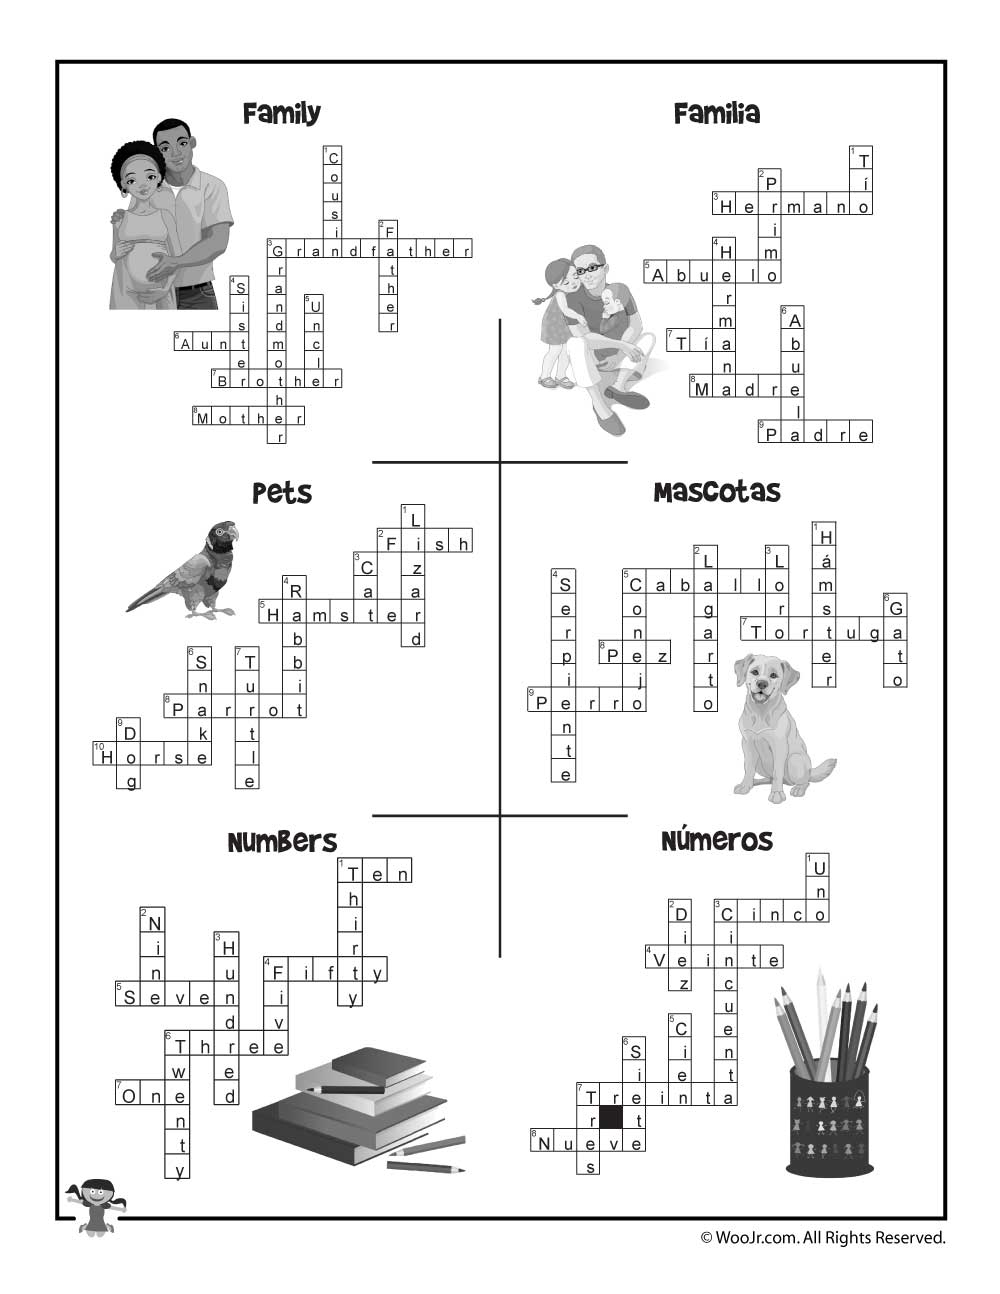 Esl Worksheet Crossword Puzzle Answers | Woo! Jr. Kids Activities - Printable Spanish Crossword Puzzle